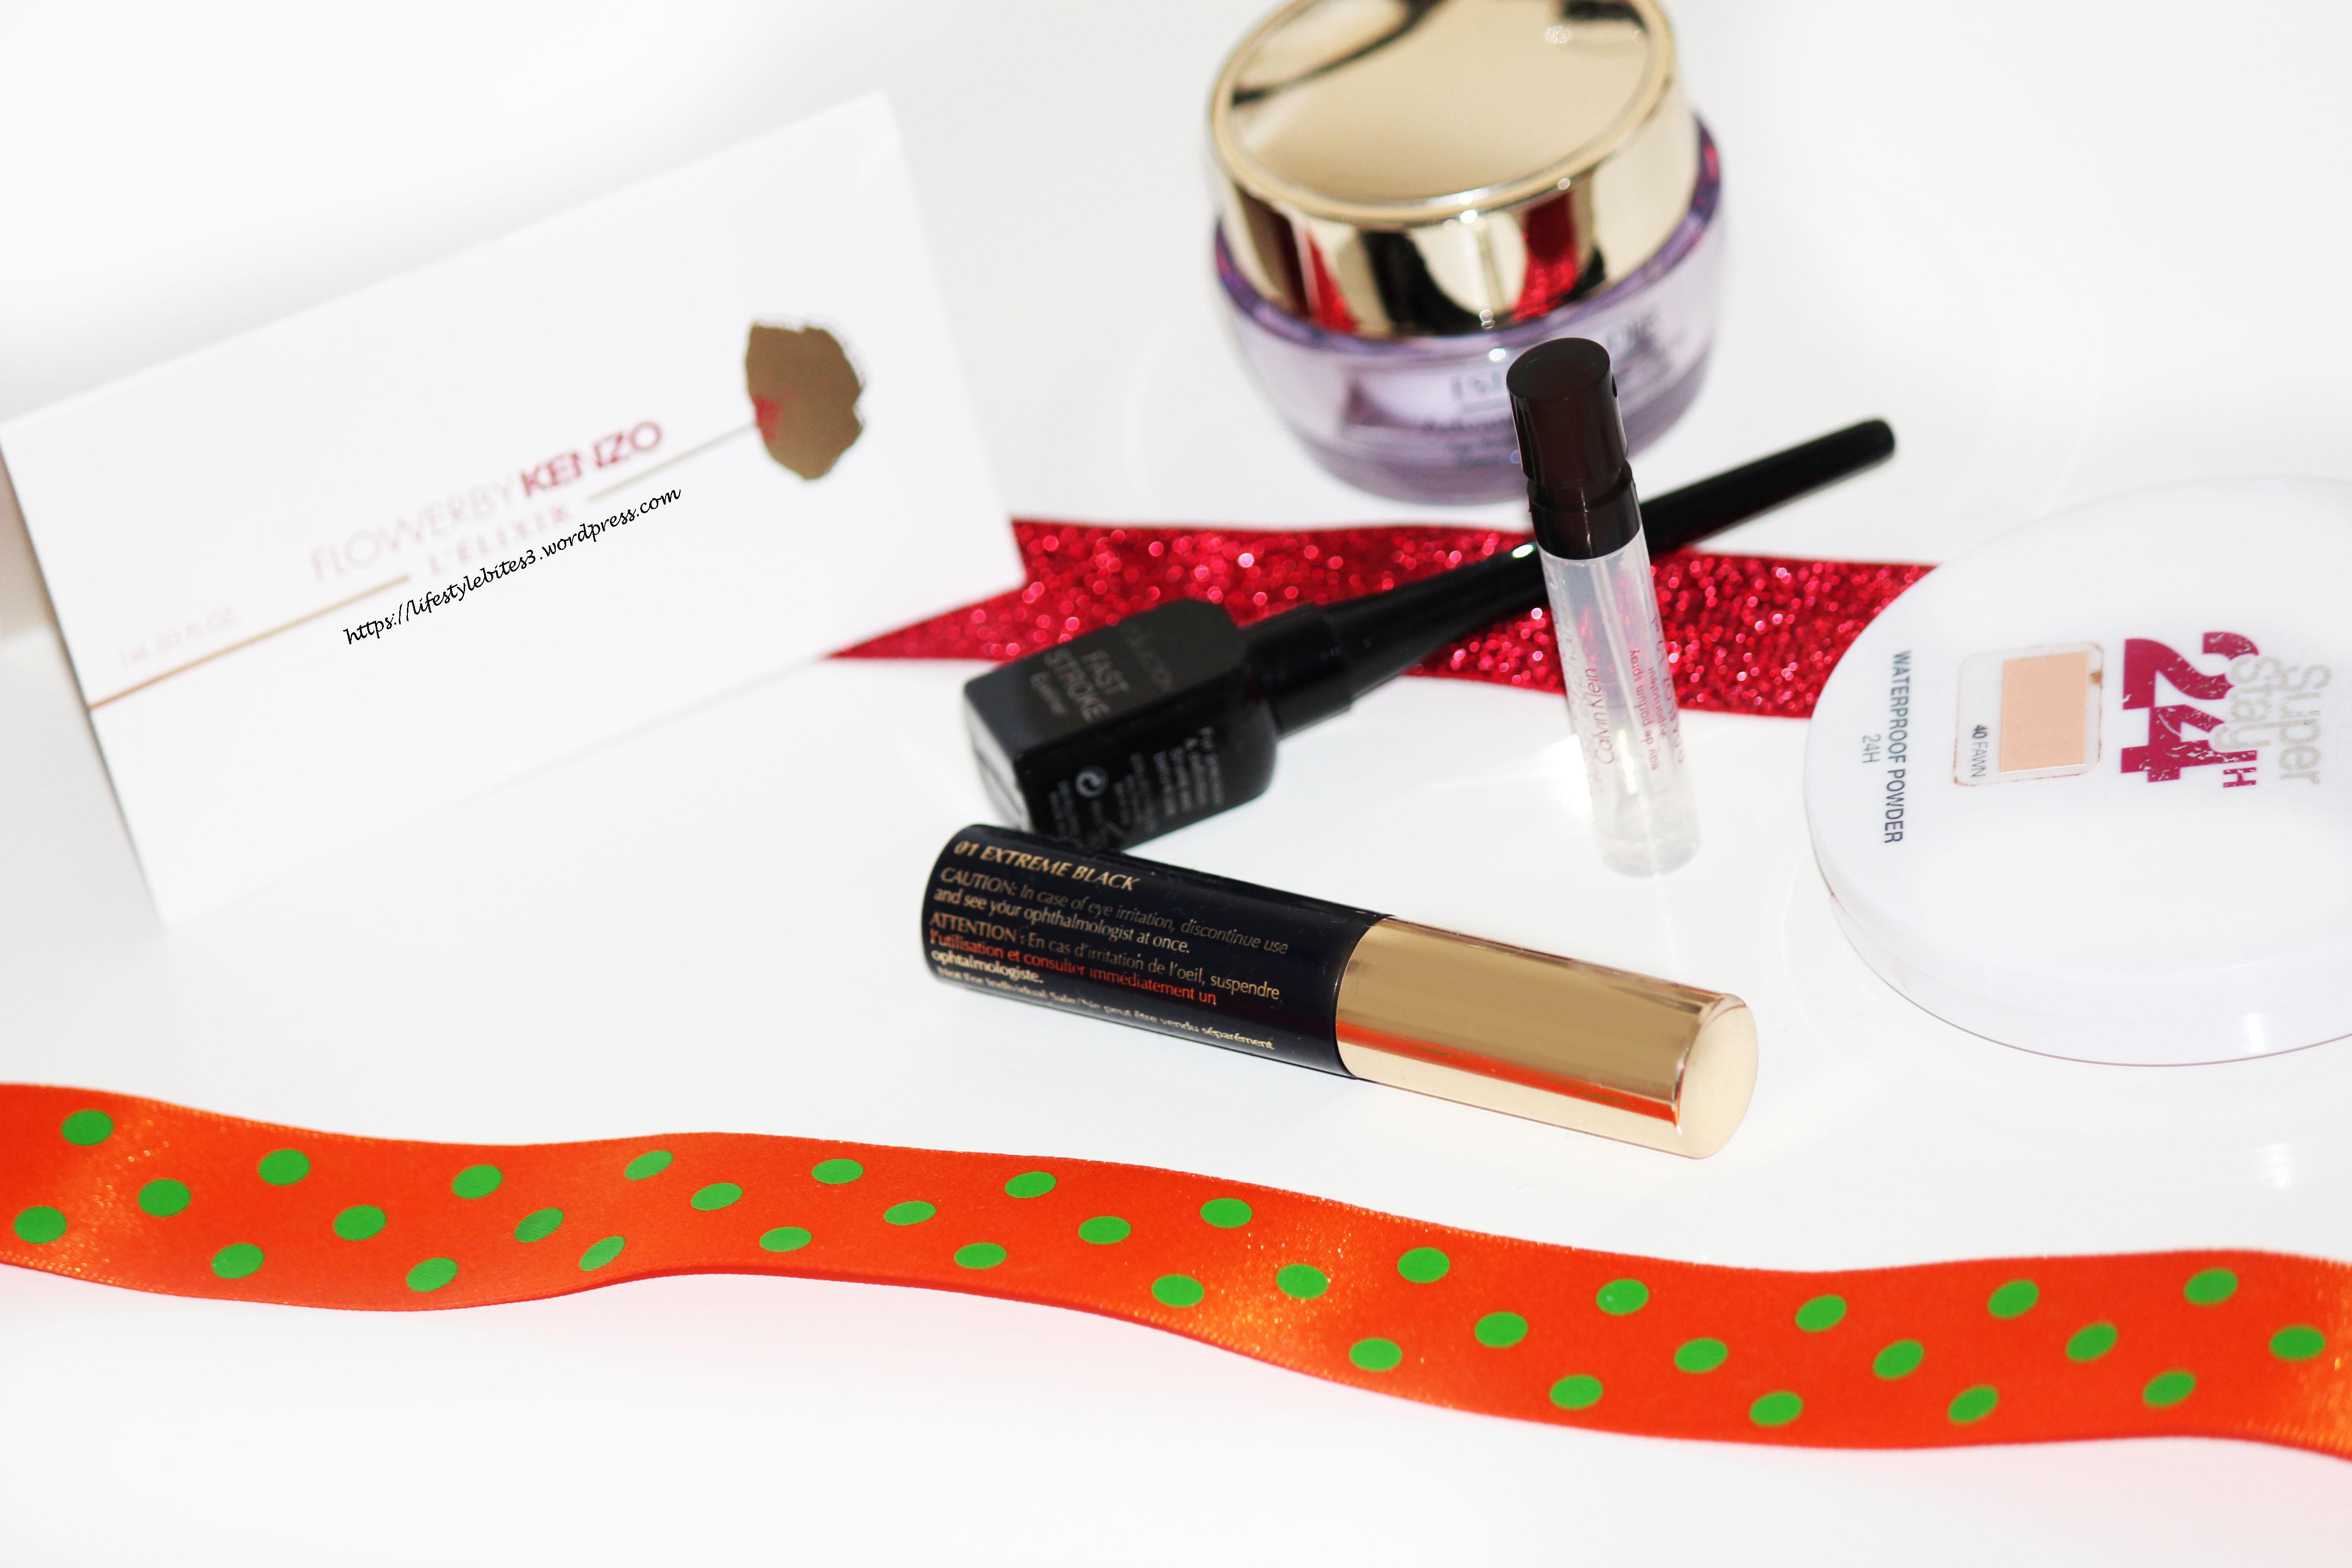 Calvin Klein, Estee Lauder, euphoria perfume, mascara, flower by keno, anti wrinkle cream advanced time zone, MUA, collection cosmetics